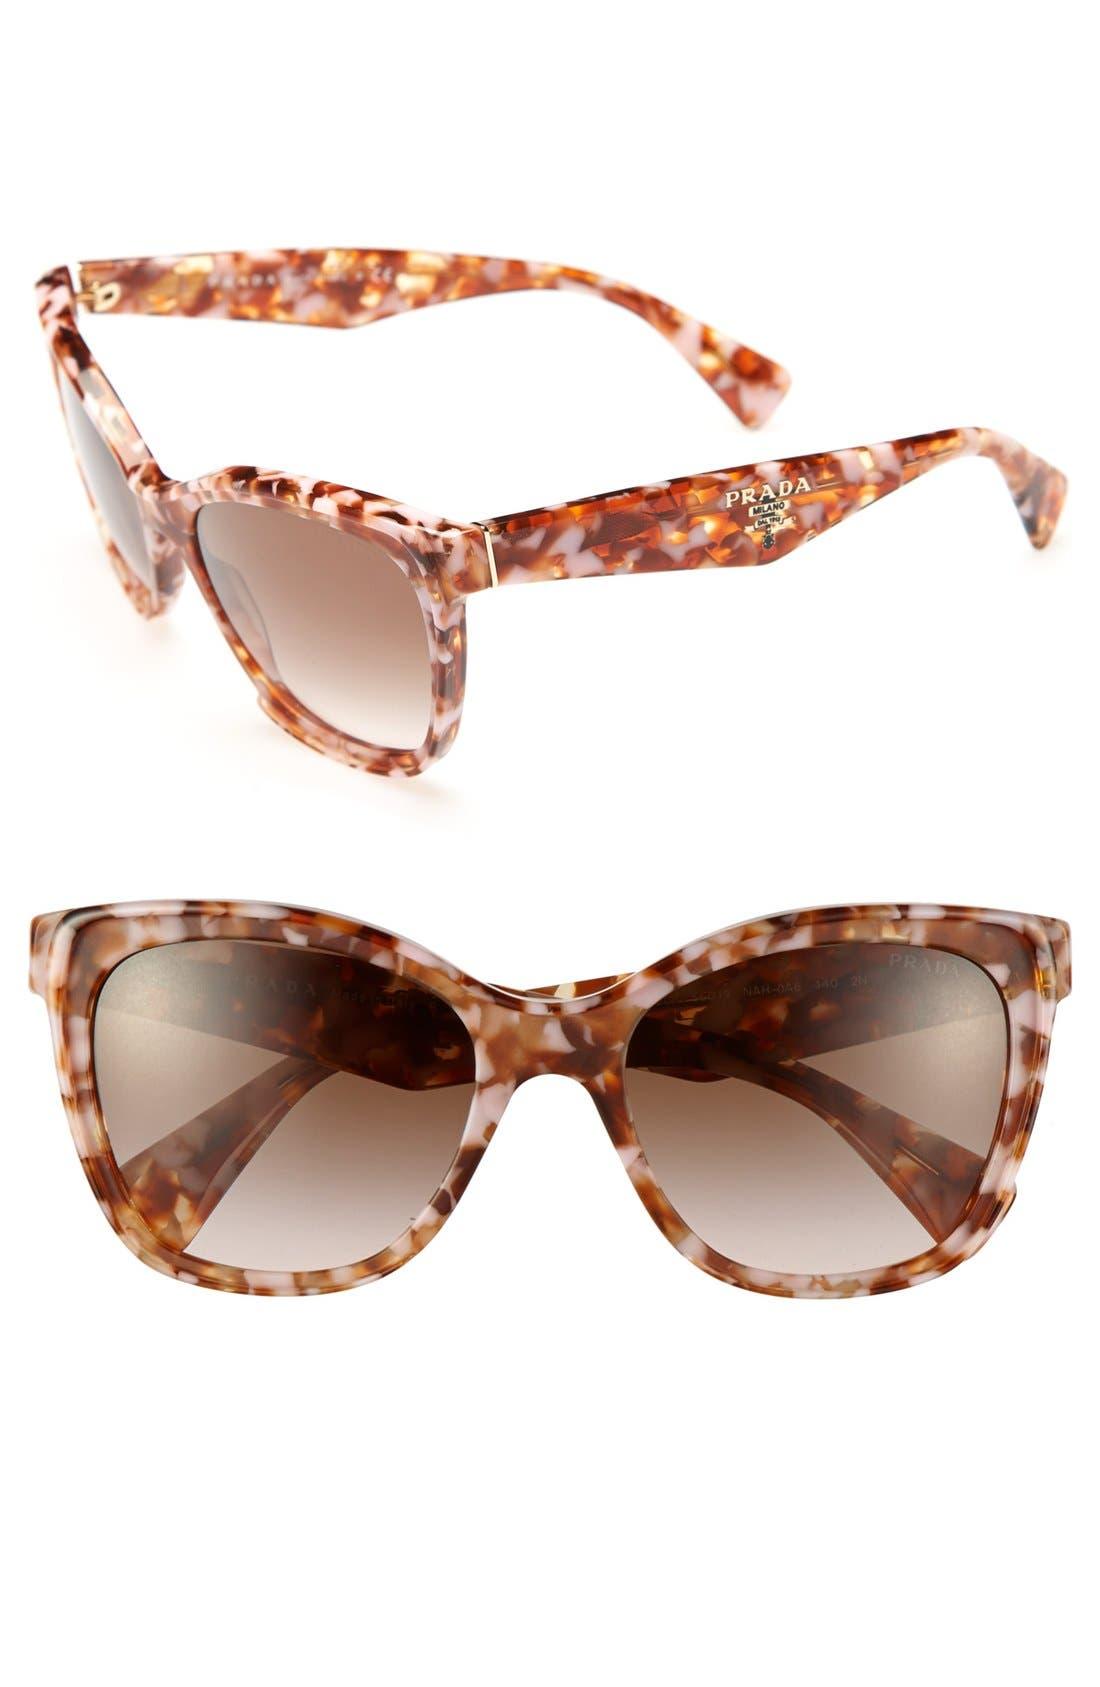 Alternate Image 1 Selected - Prada 56mm Oversized Retro Sunglasses